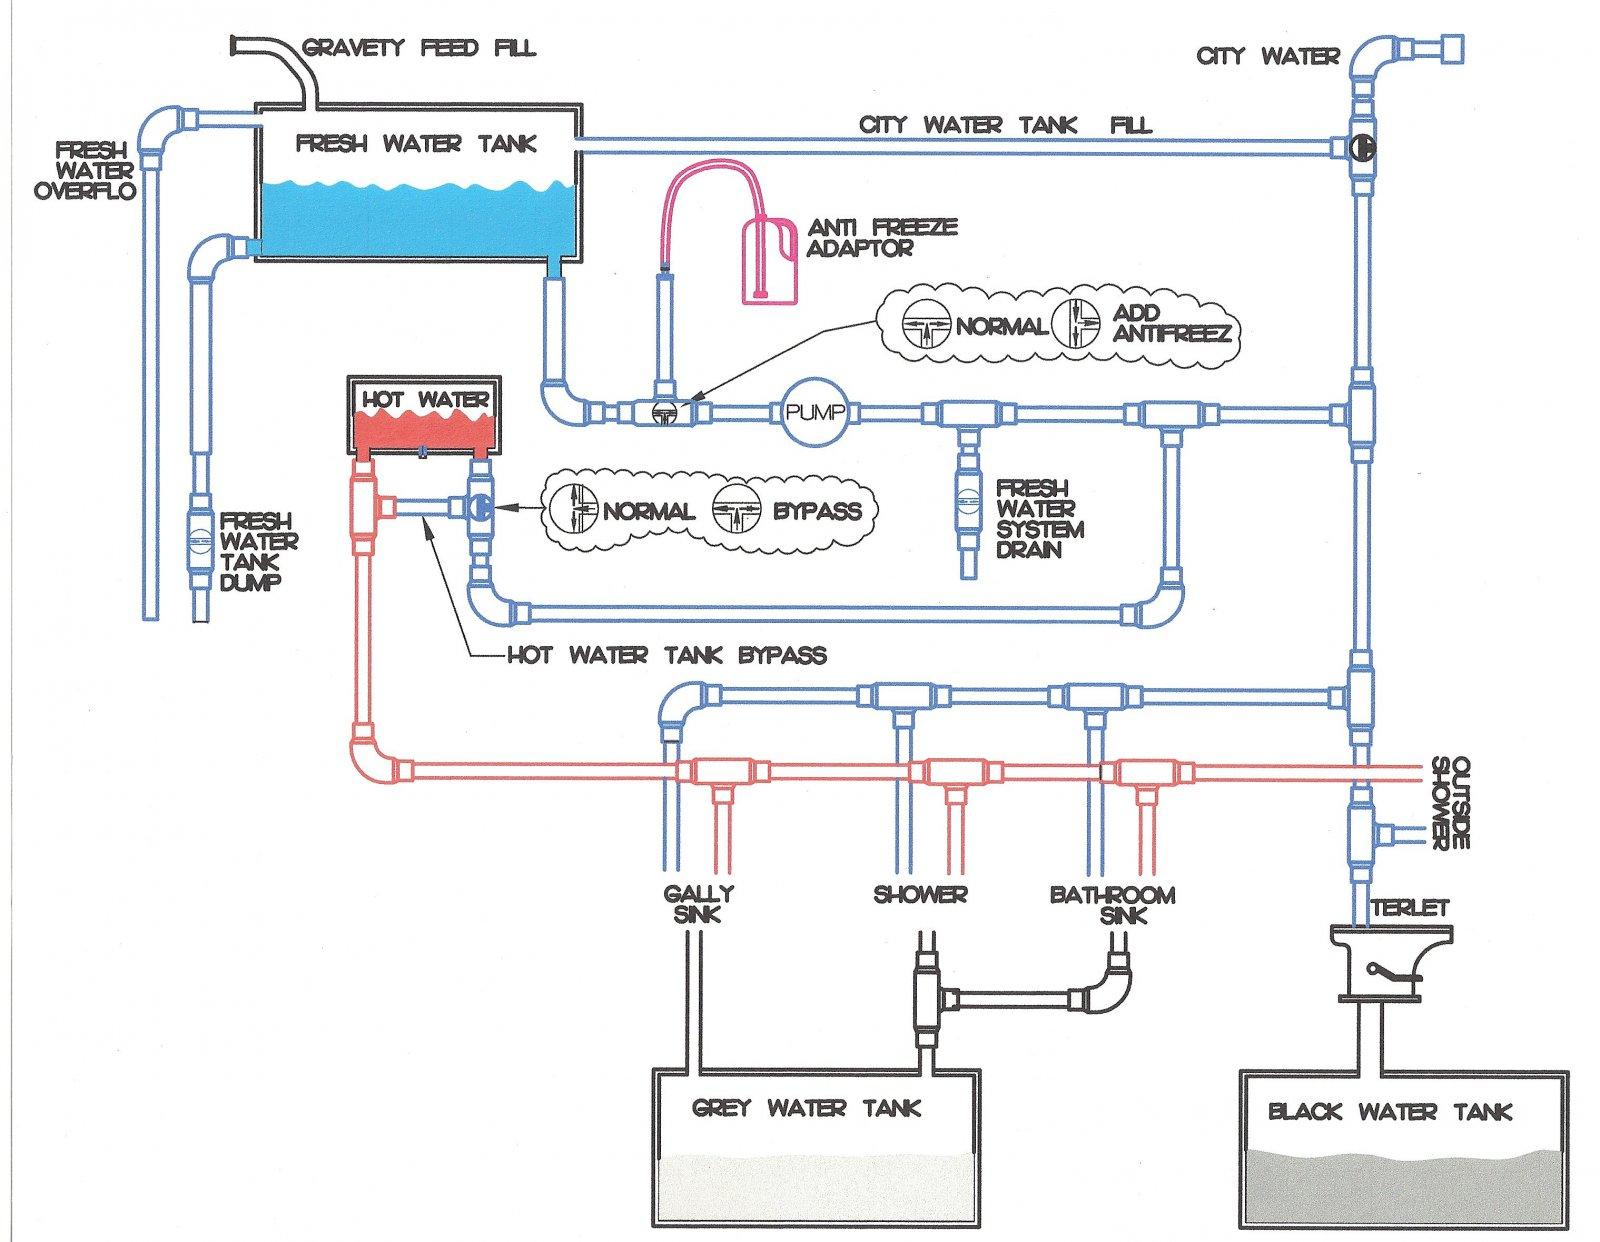 grey water plumbing diagram  grey  free engine image for